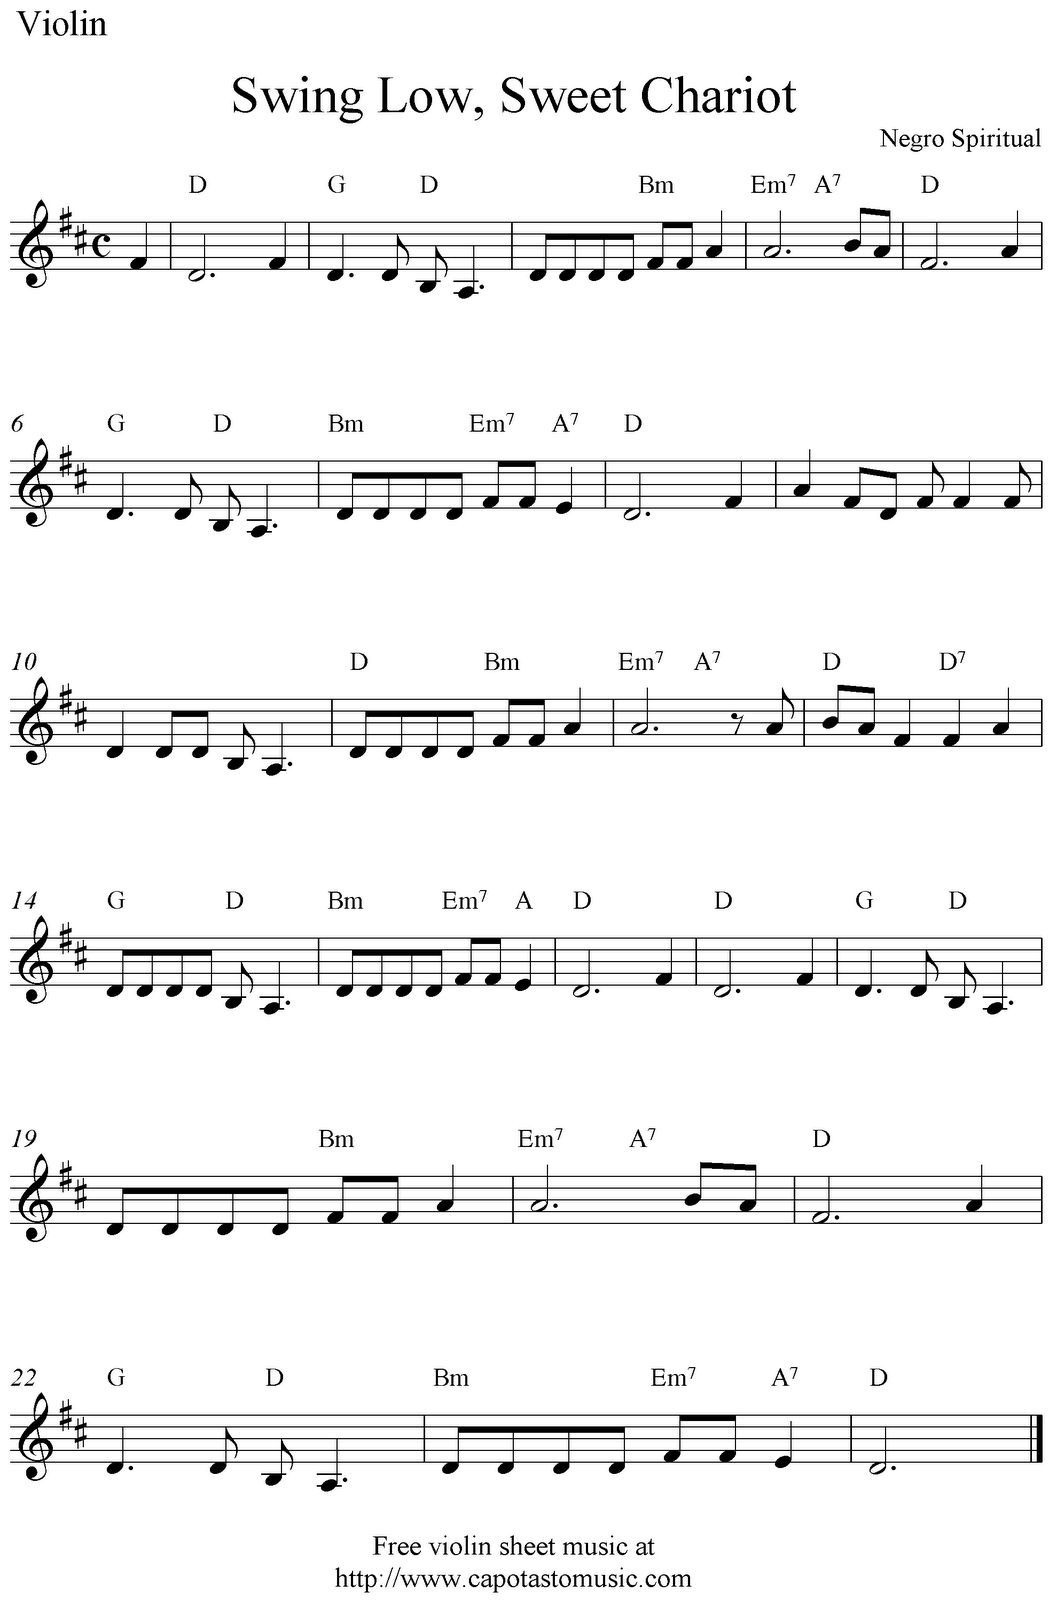 Swing Low Sweet Chariot Violin Sheet Music Violin Sheet Music